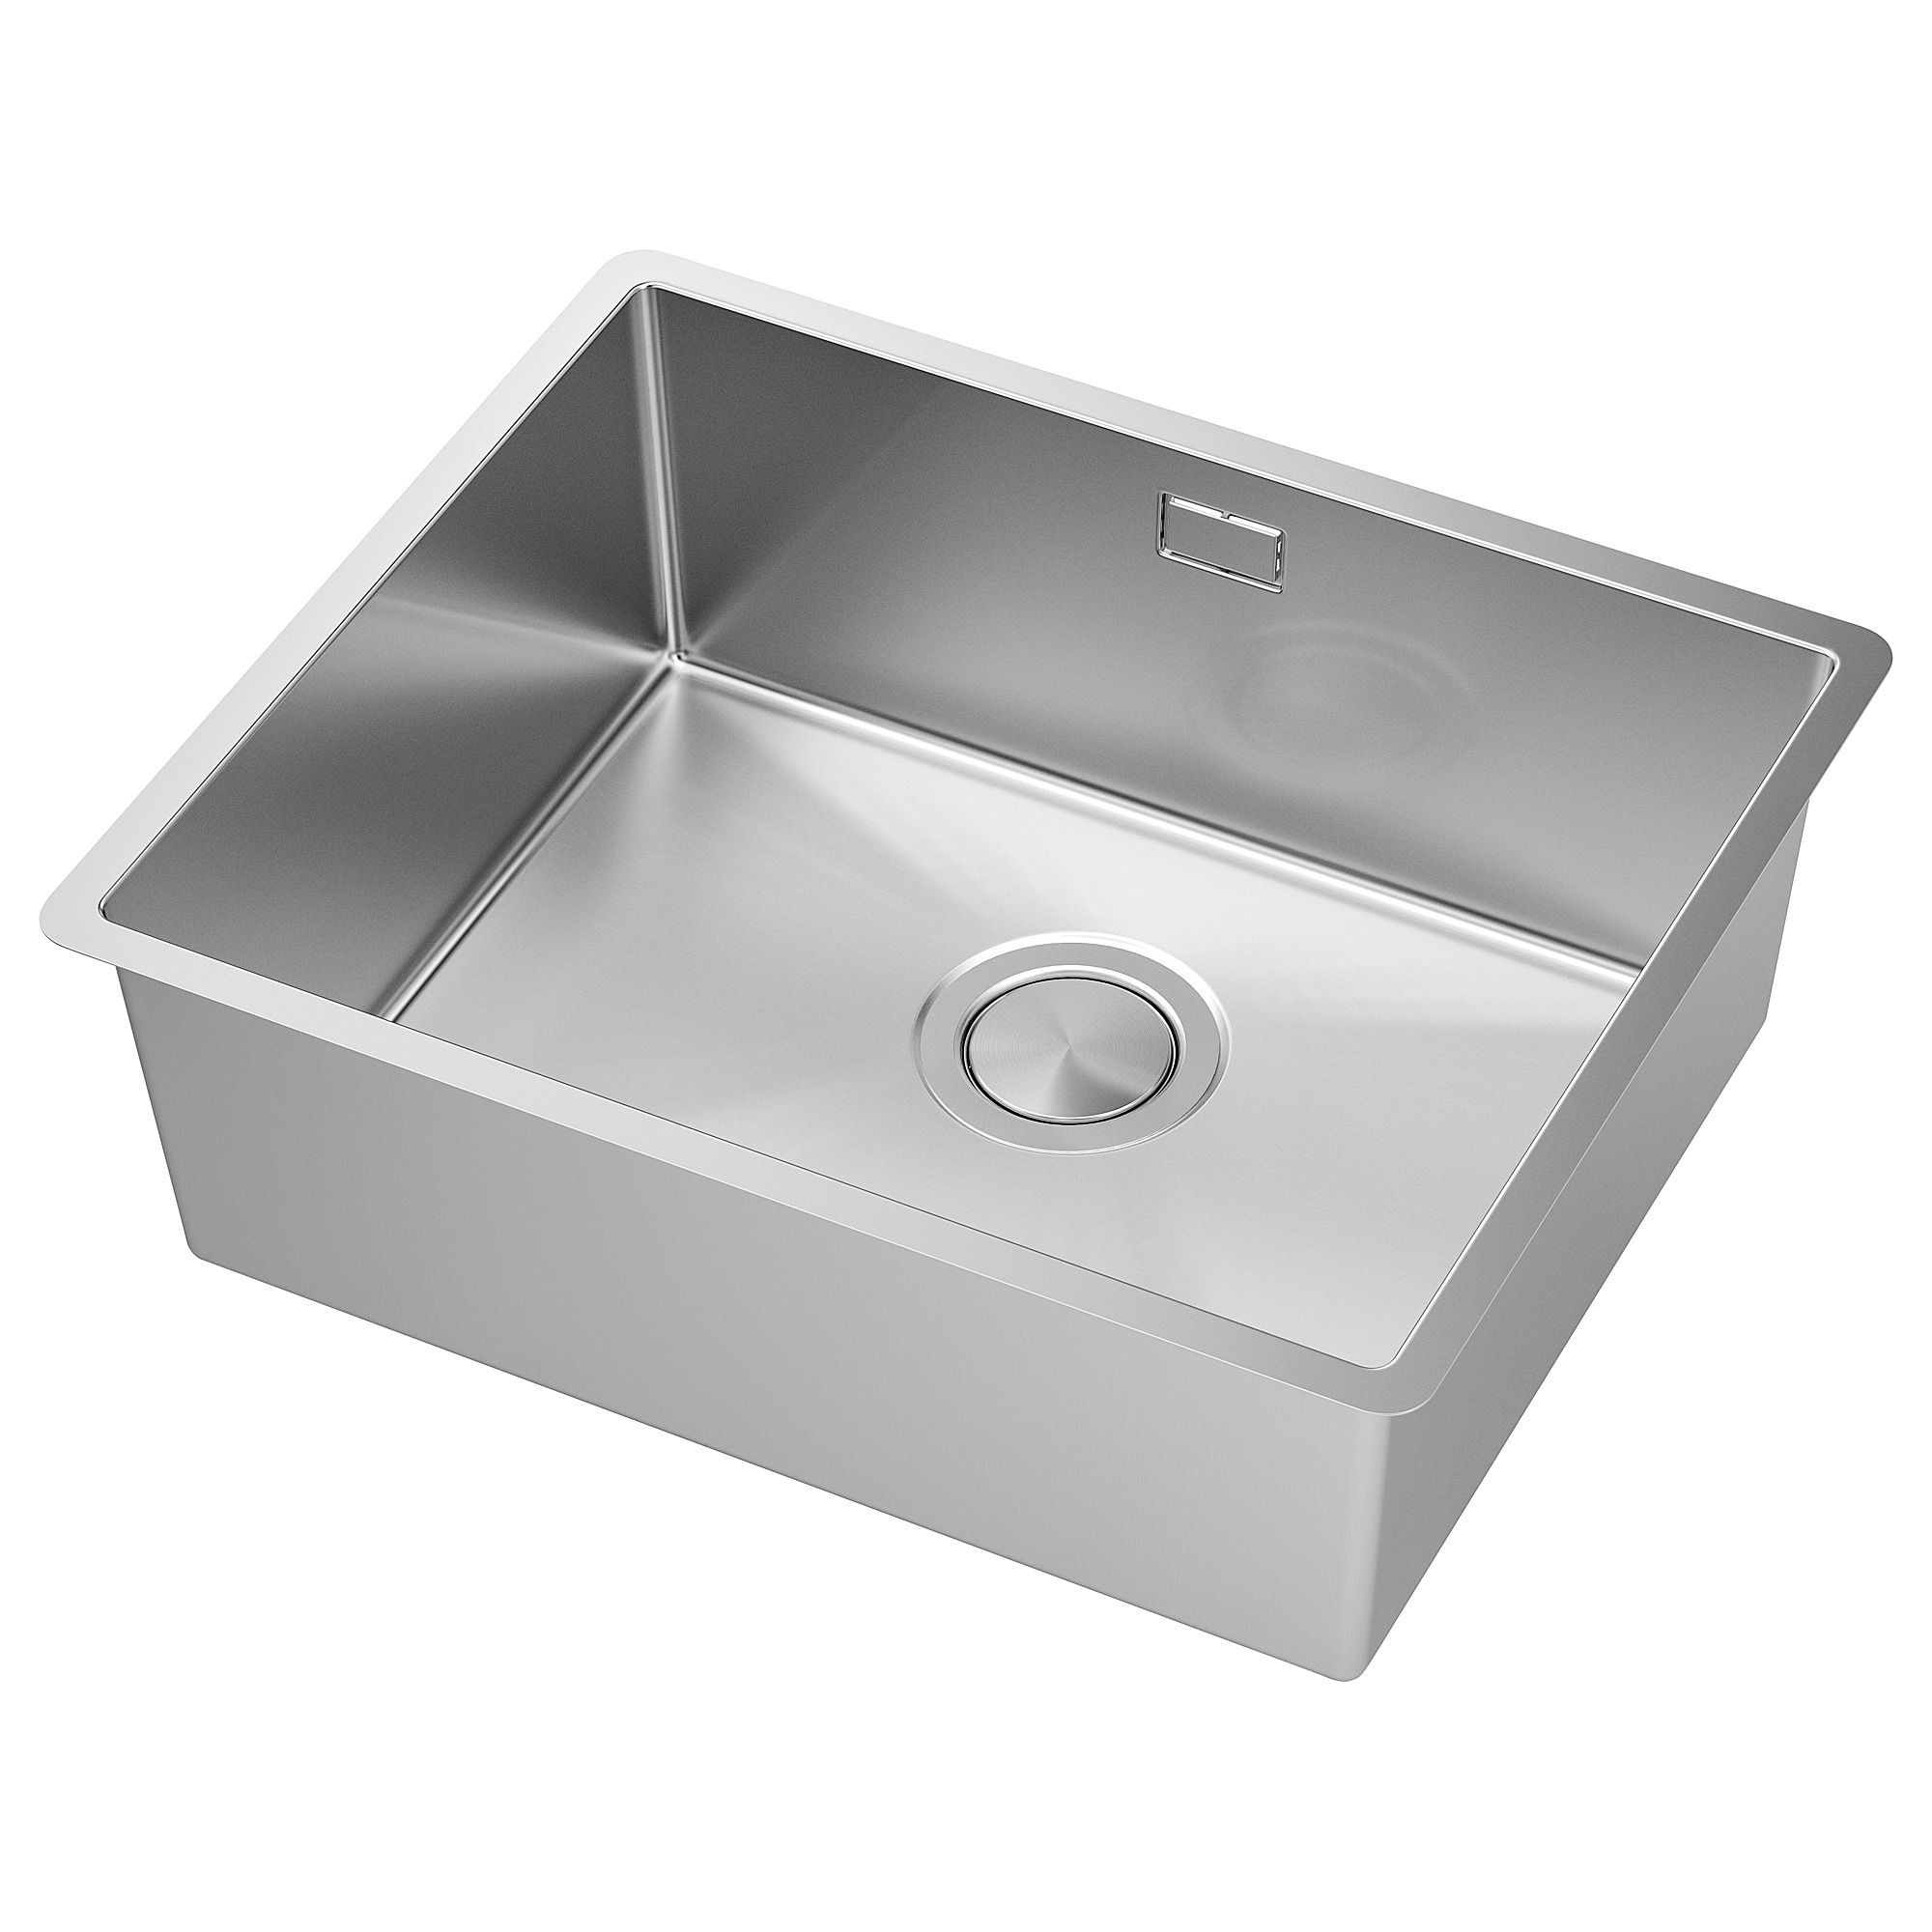 Norrsjon Inset Sink 1 Bowl Stainless Steel Ikea Inset Sink Sink Sink Accessories